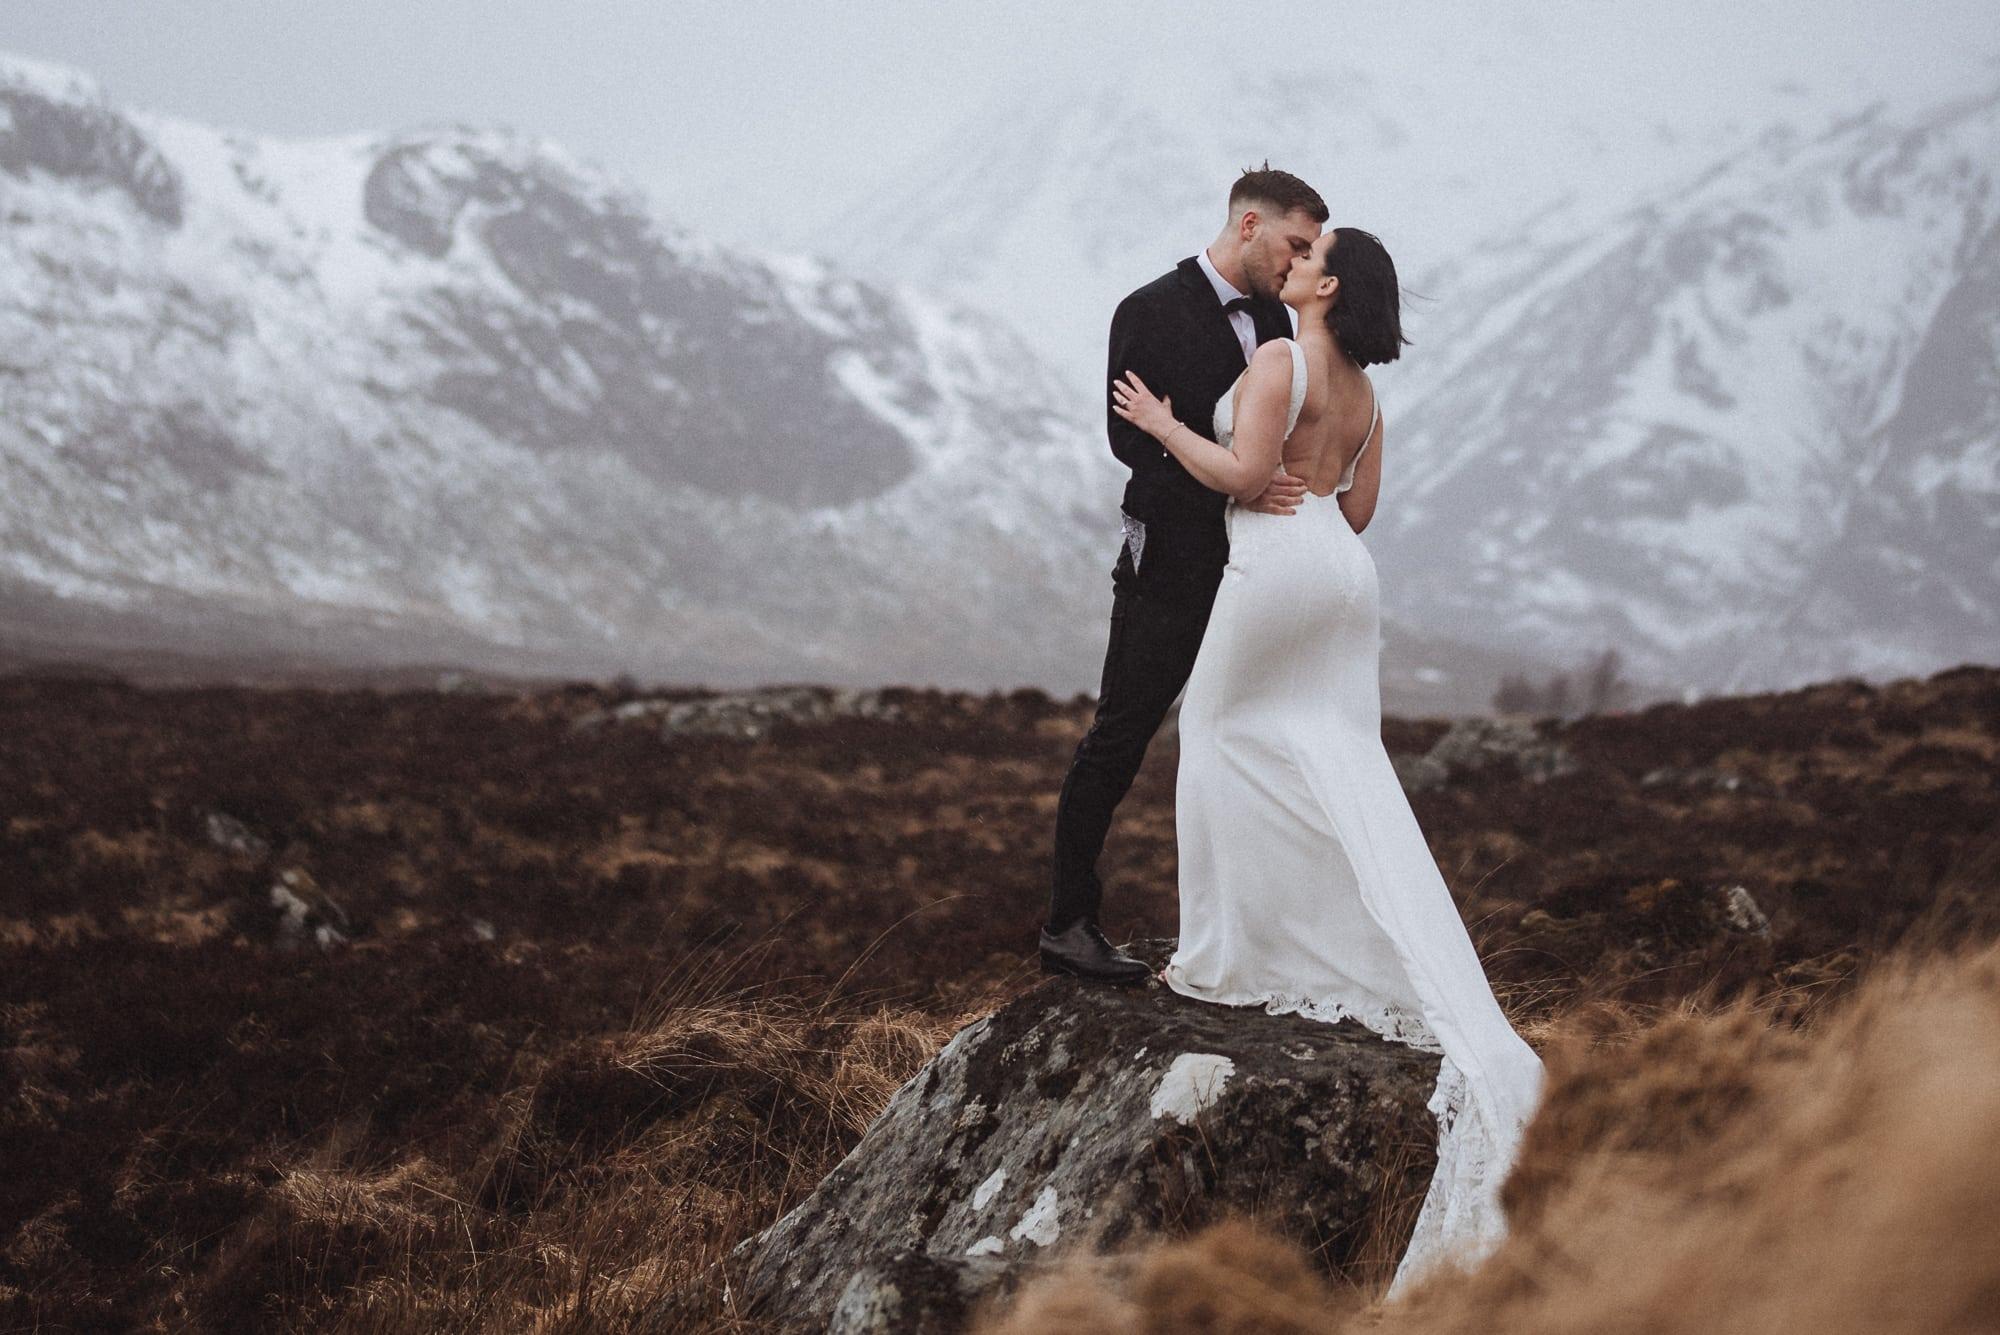 Wedding Photographer win Birmingham Tianna J-Williams Weddings